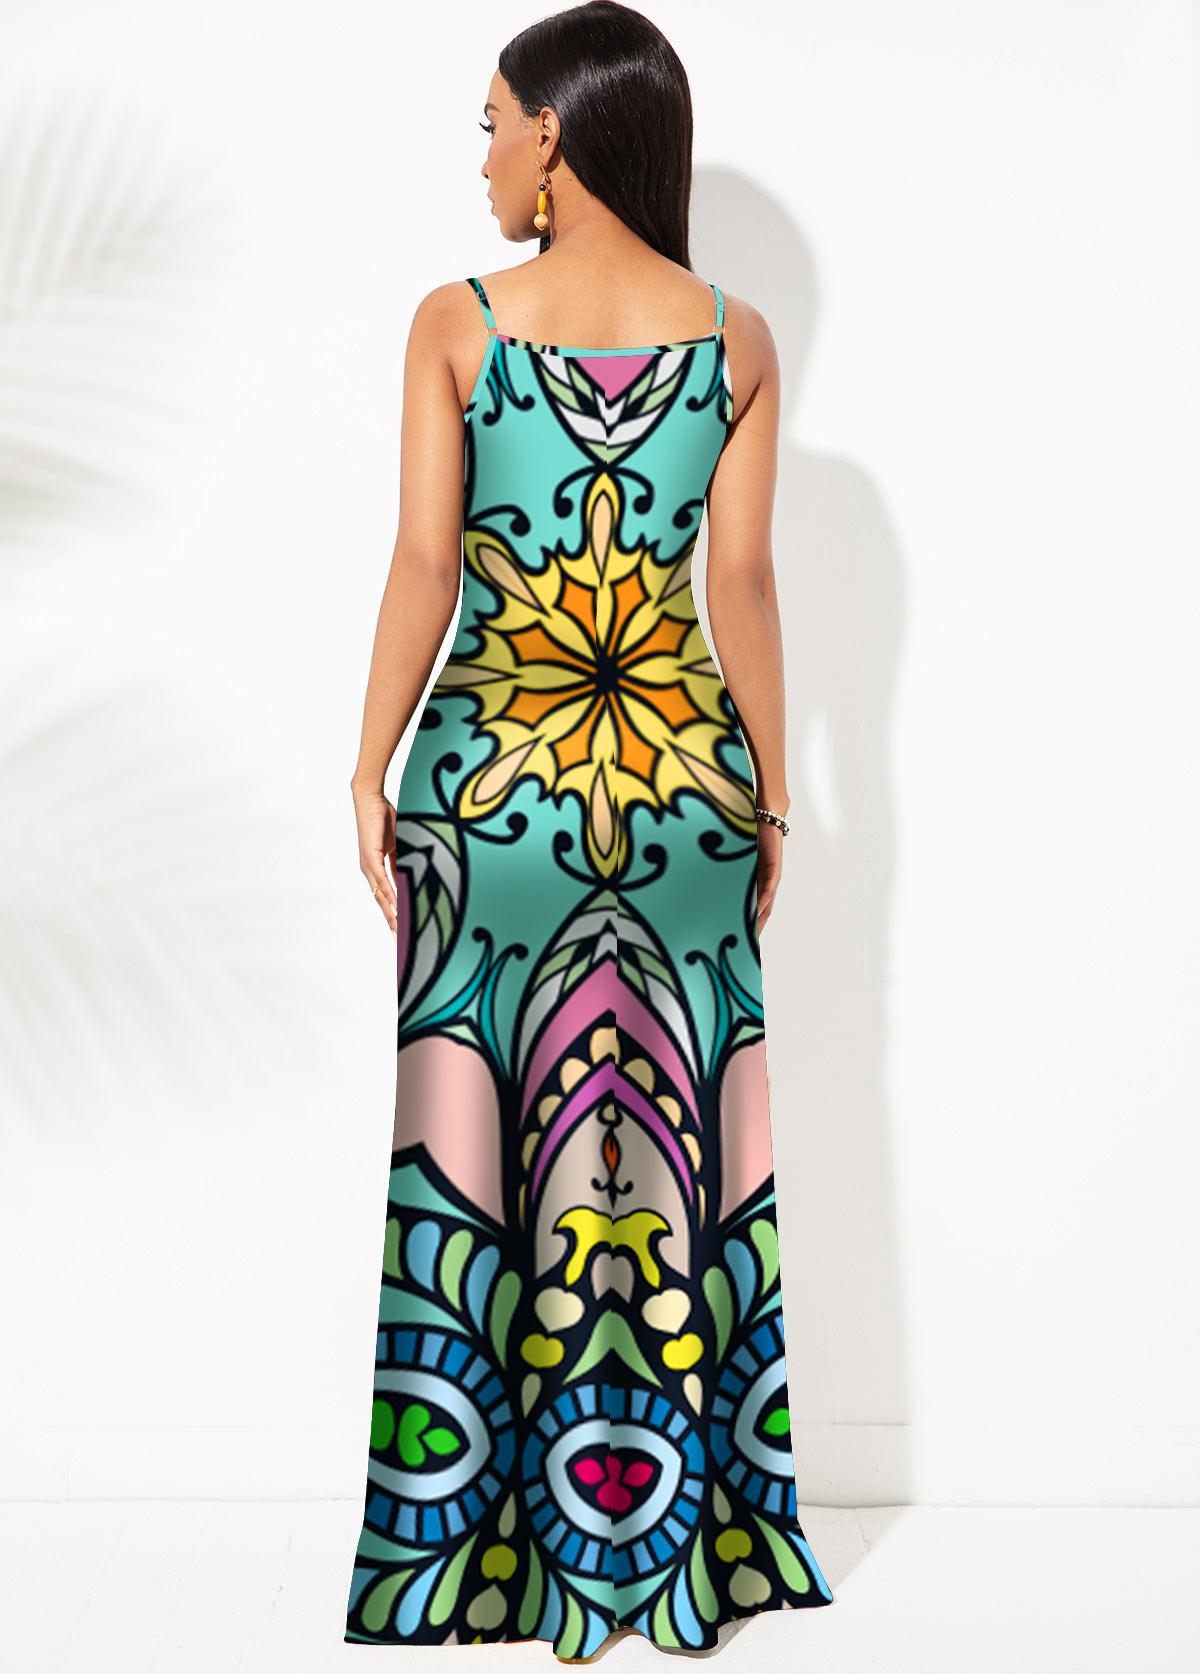 Spaghetti Strap Tribal Print Mermaid Dress